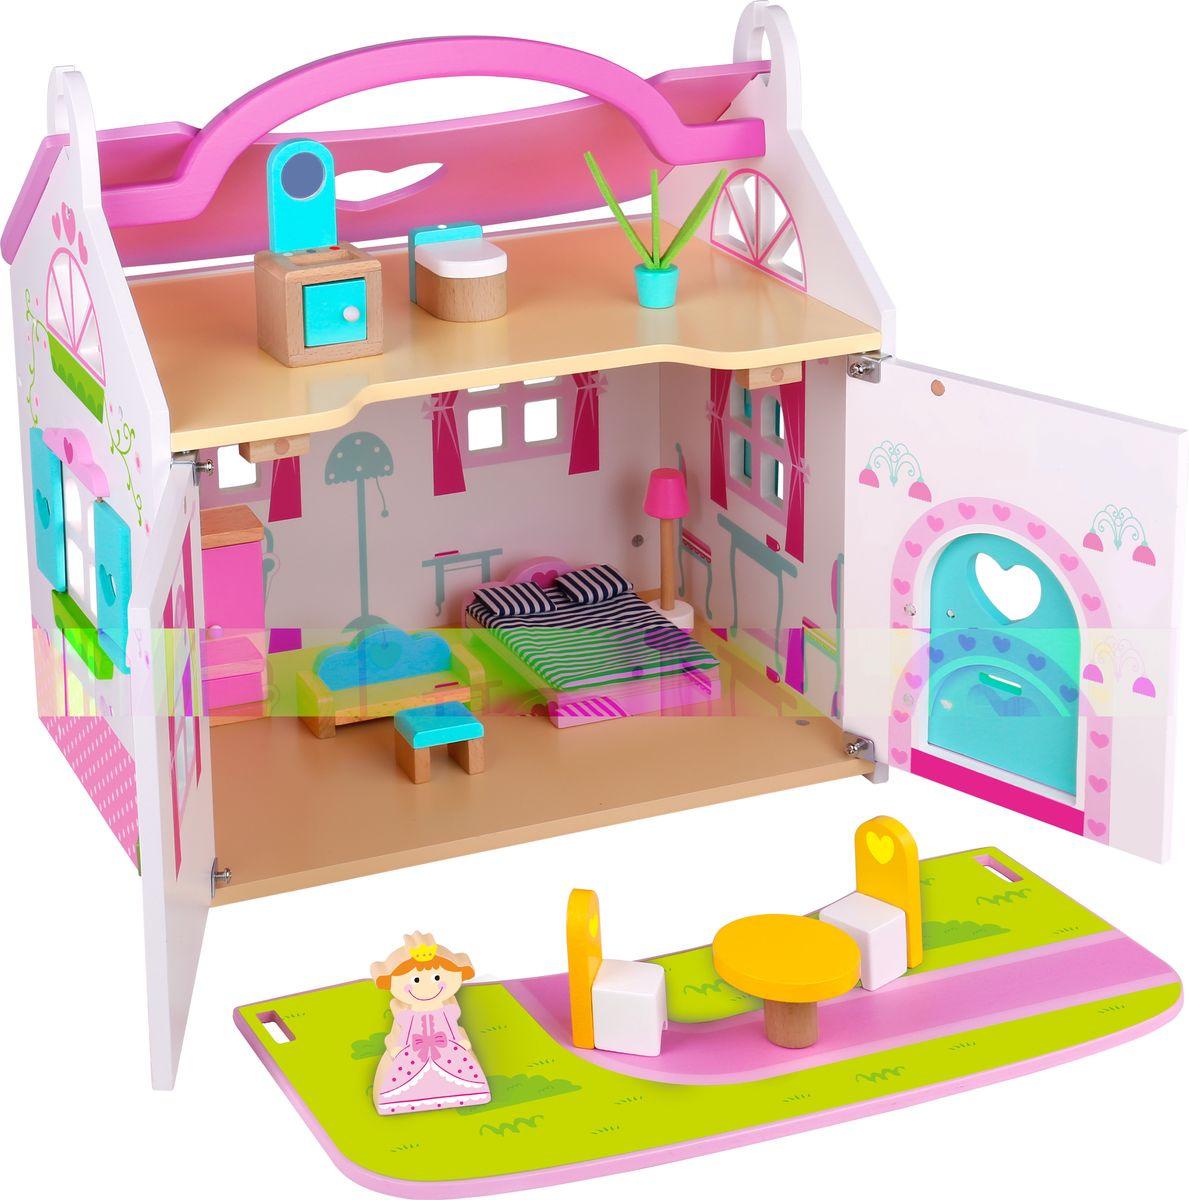 Дом для кукол Tooky Toy, TKI050